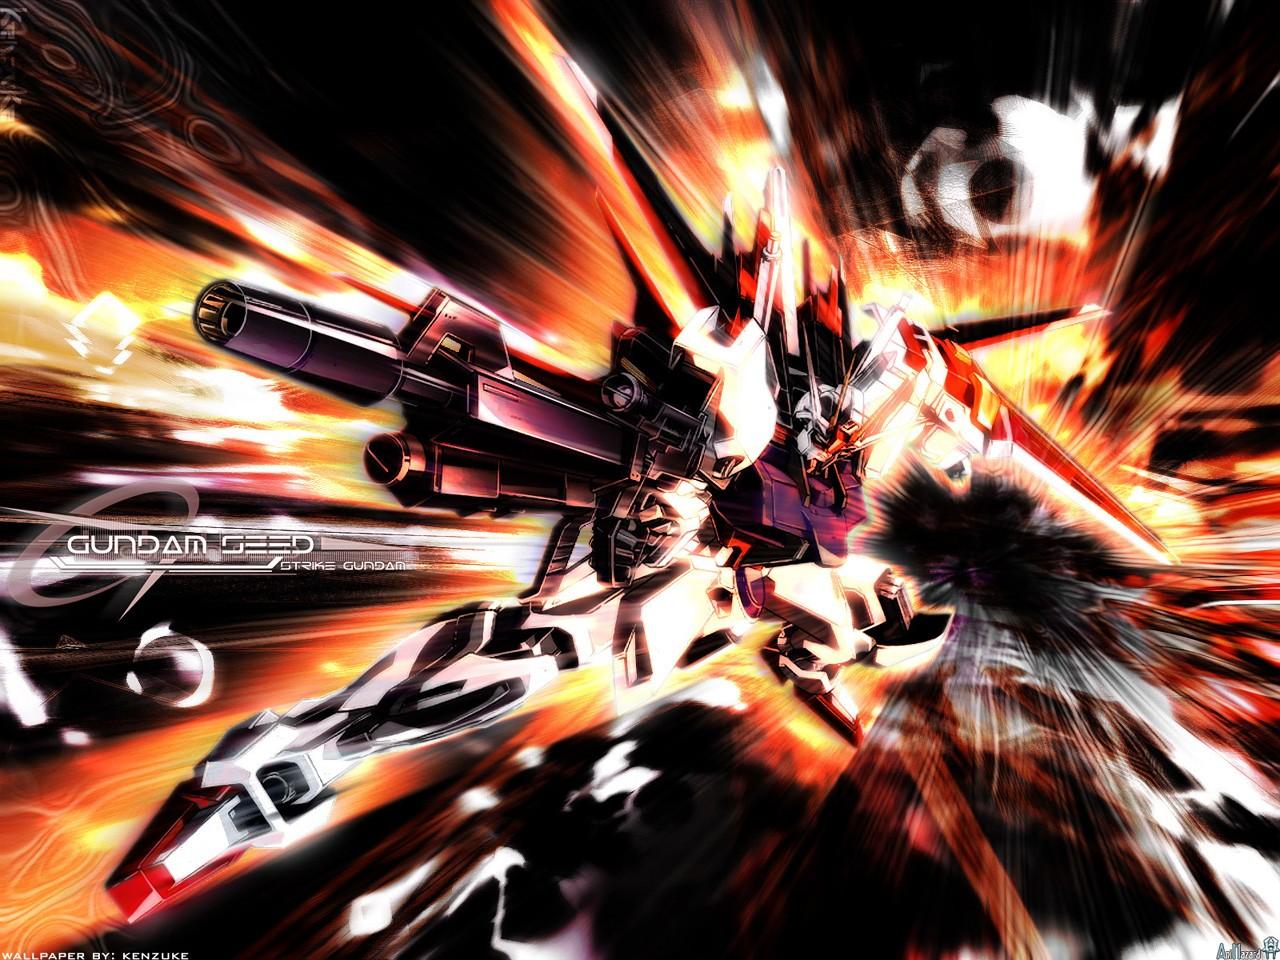 Fondos De Pantalla Anime Mobile Suit Gundam Seed Captura